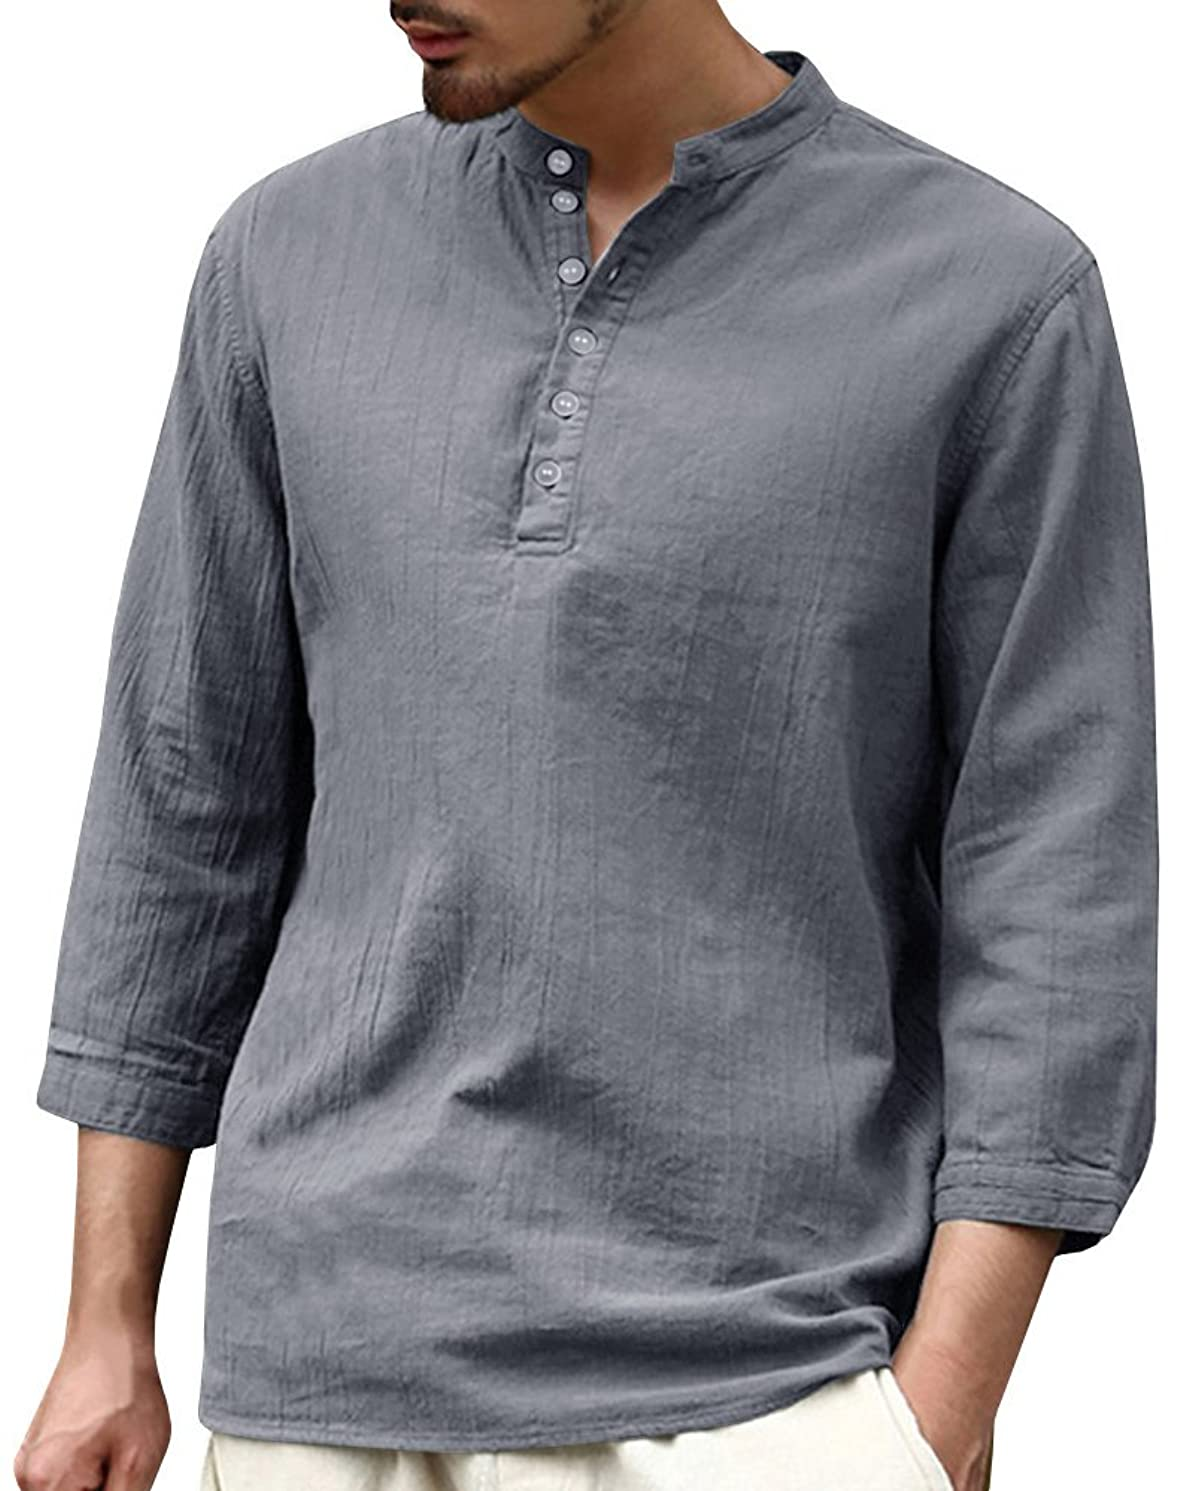 Beotyshow Mens Summer Linen 3/4 Sleeve Golf Shirts Loose Fit Workout Casual Beach Henley Shirt Fishing Tees for Men